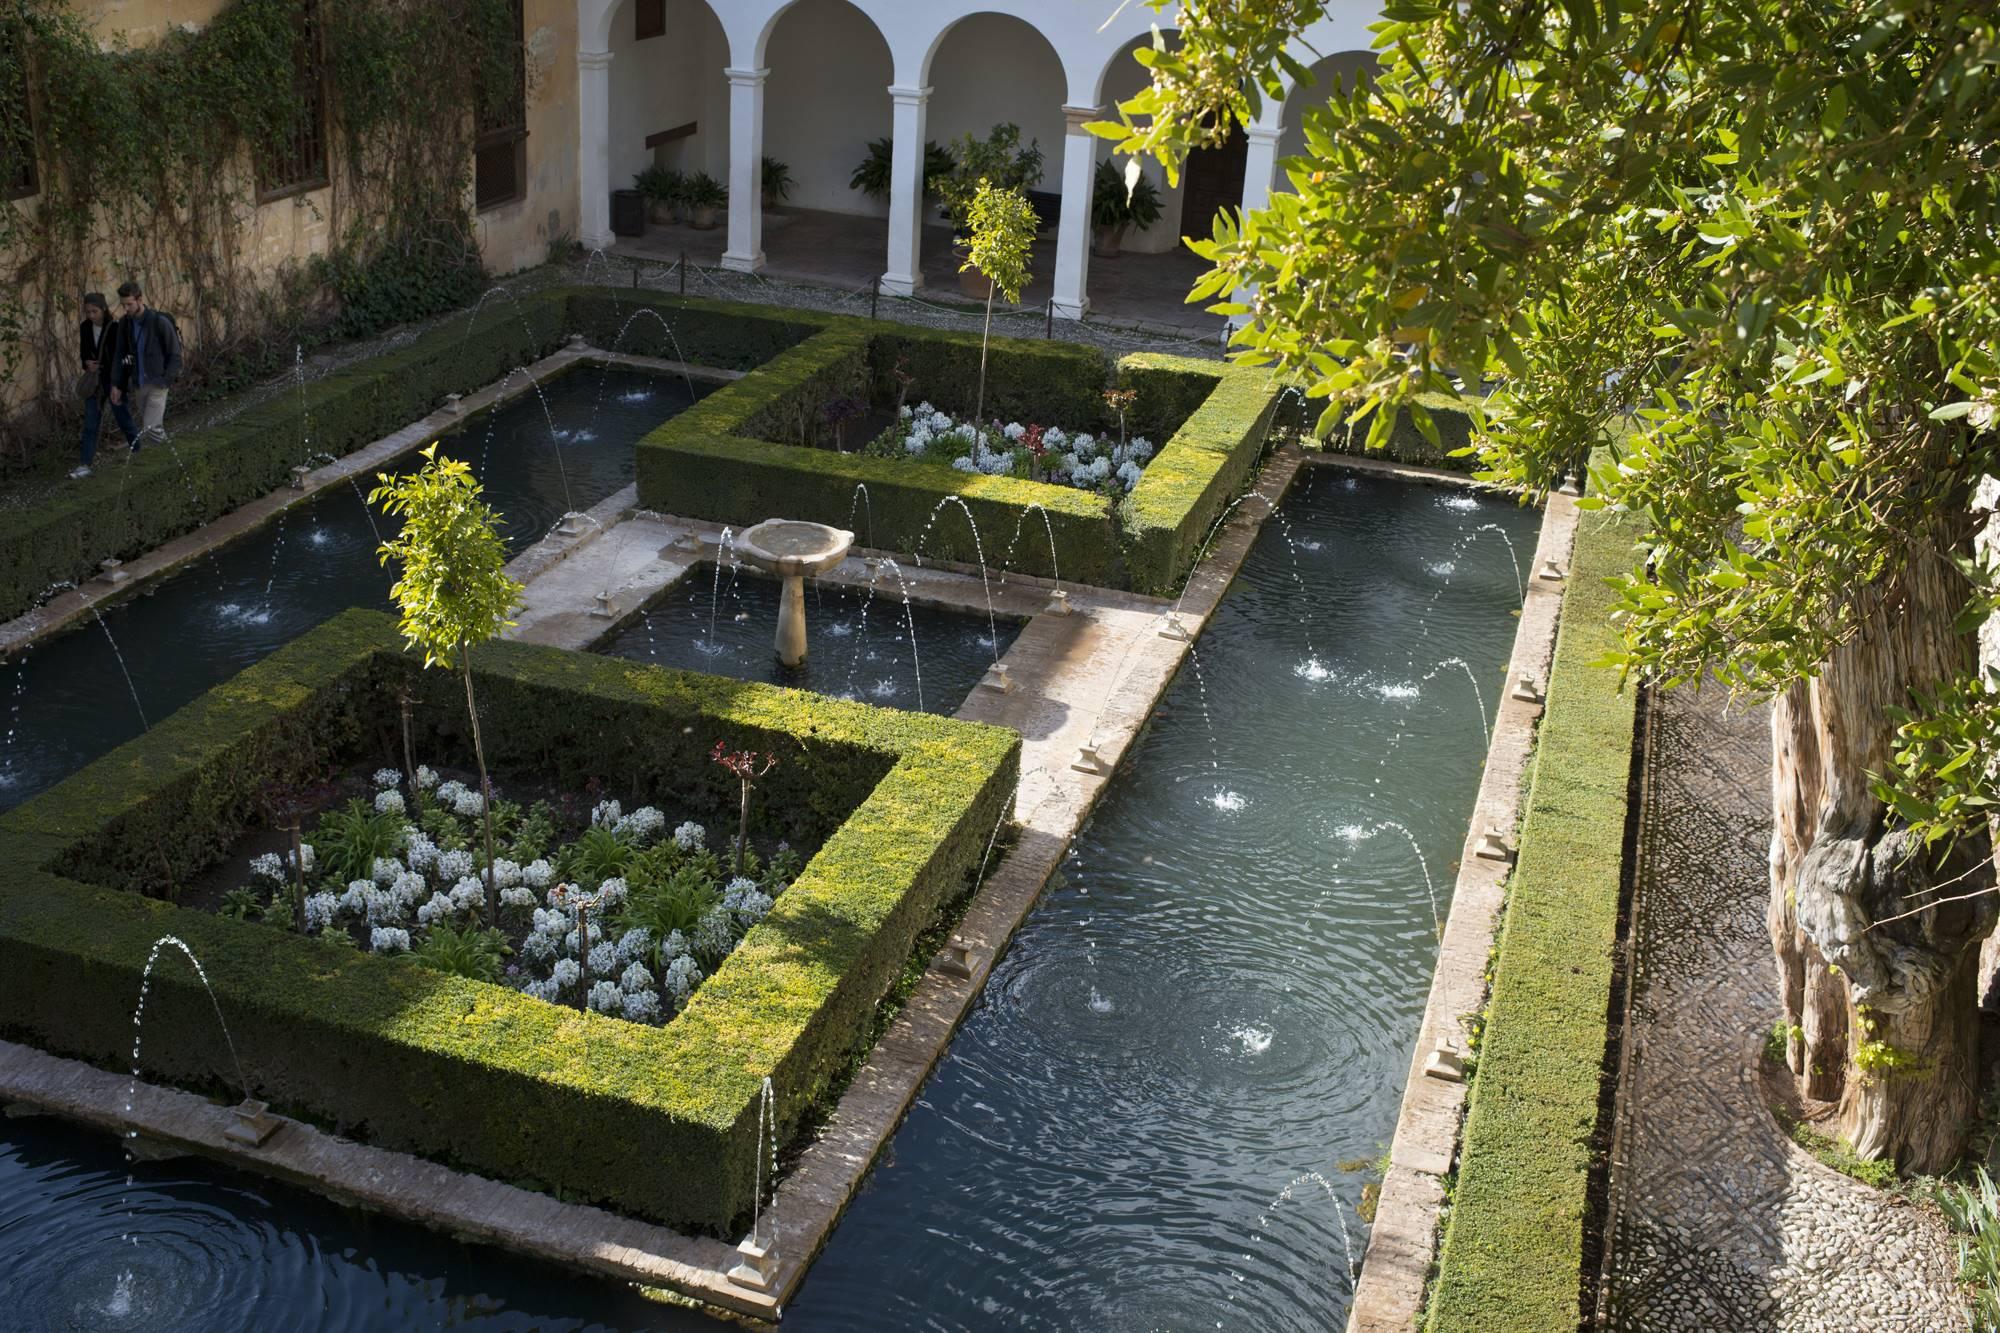 patio de la sultana generalife alhambra granada